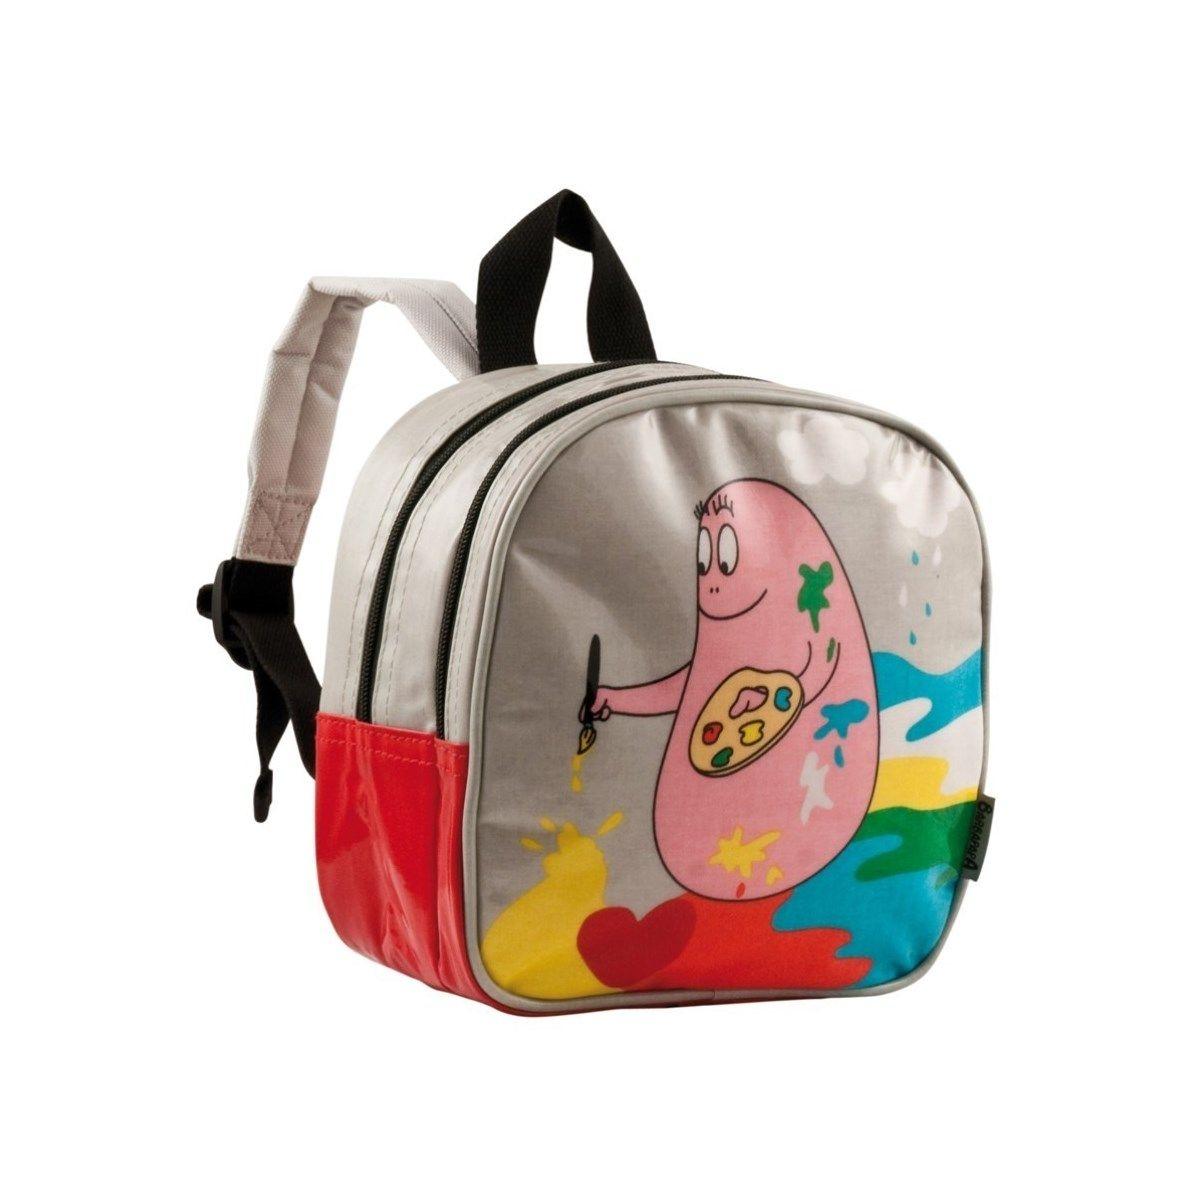 Petit sac à dos Barbapapa Peinture